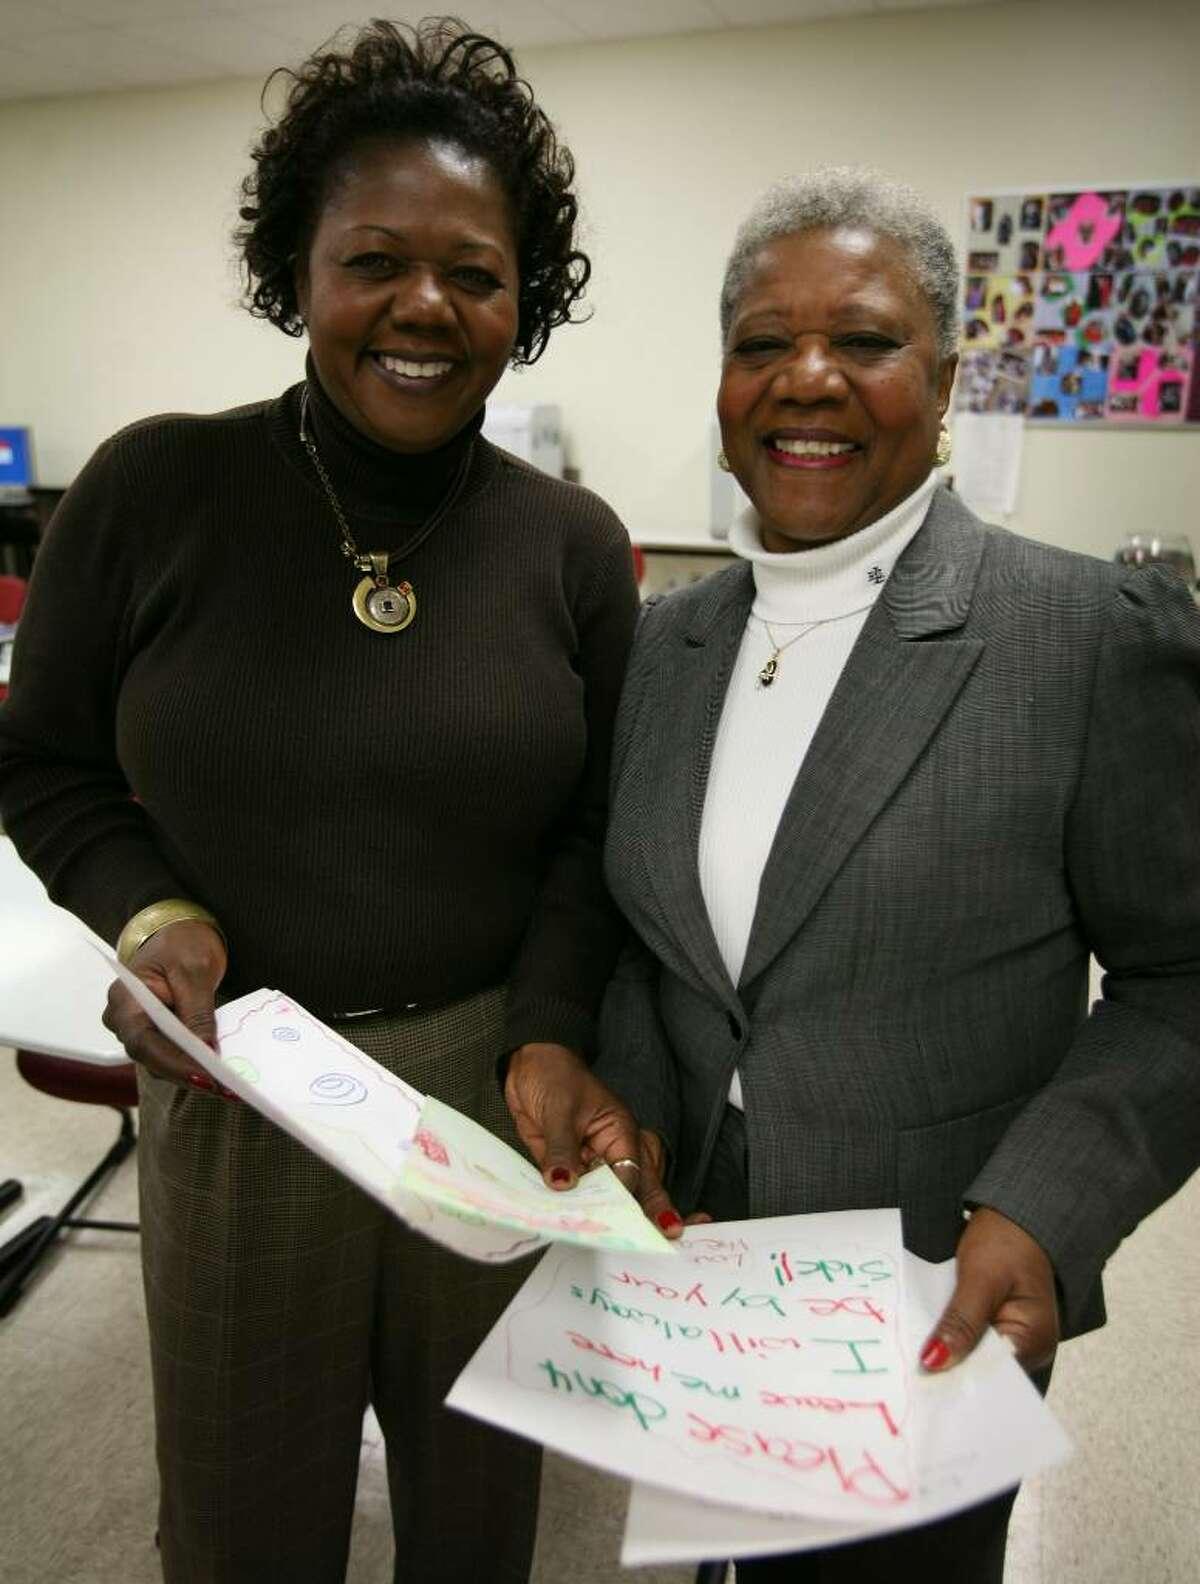 Assistant Supt. of Schools Denise Clemons, left and her mother Barbara Clemons recently participated in a door-to-door